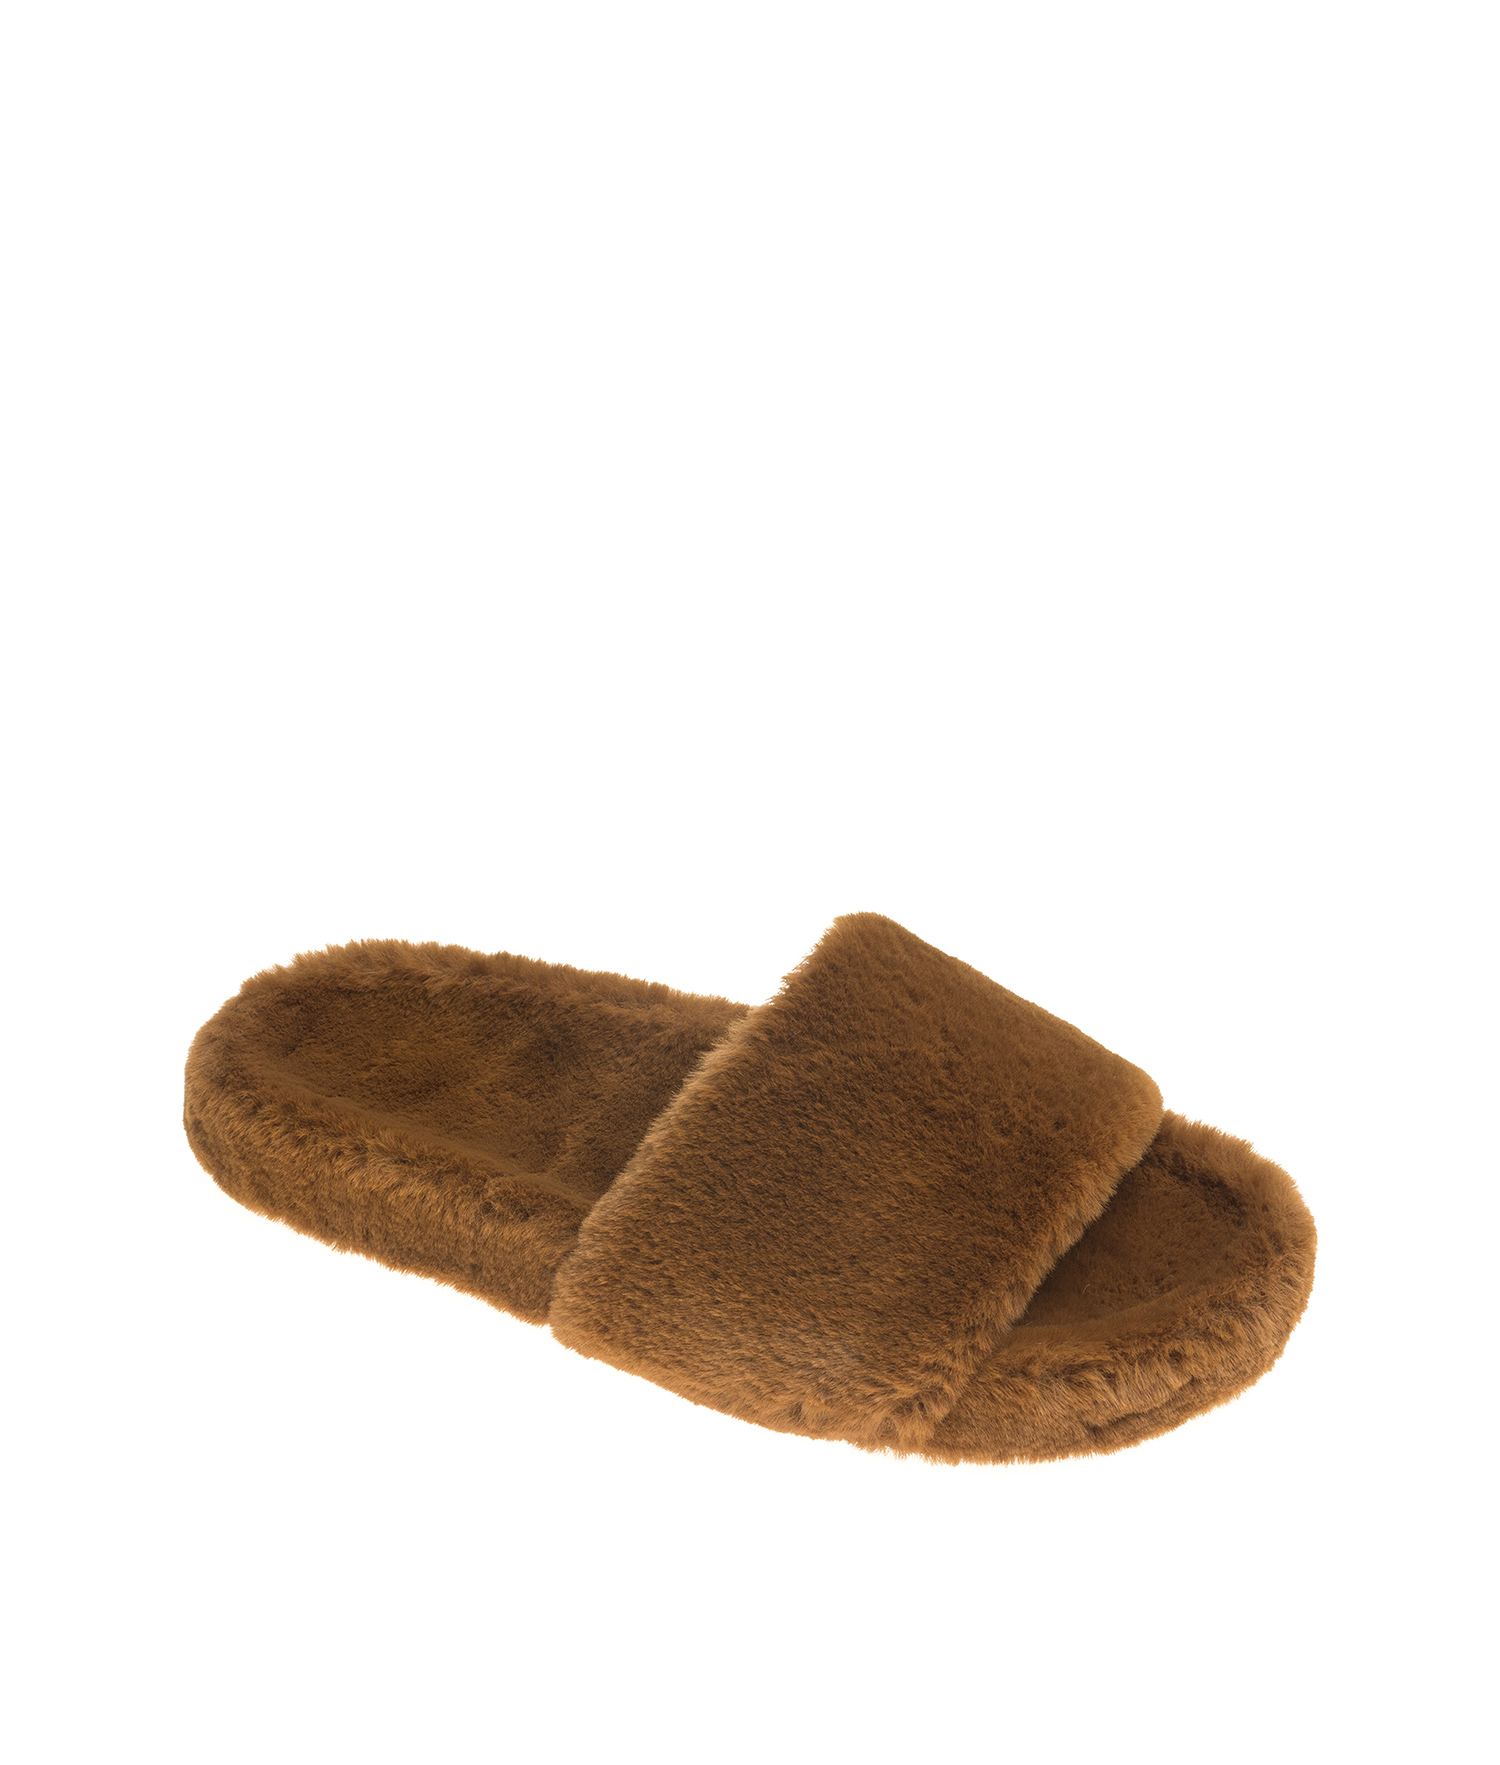 0db9ecd6d4aa AnnaKastle Womens Soft Fluffy Faux Fur Slide Sandals Brown